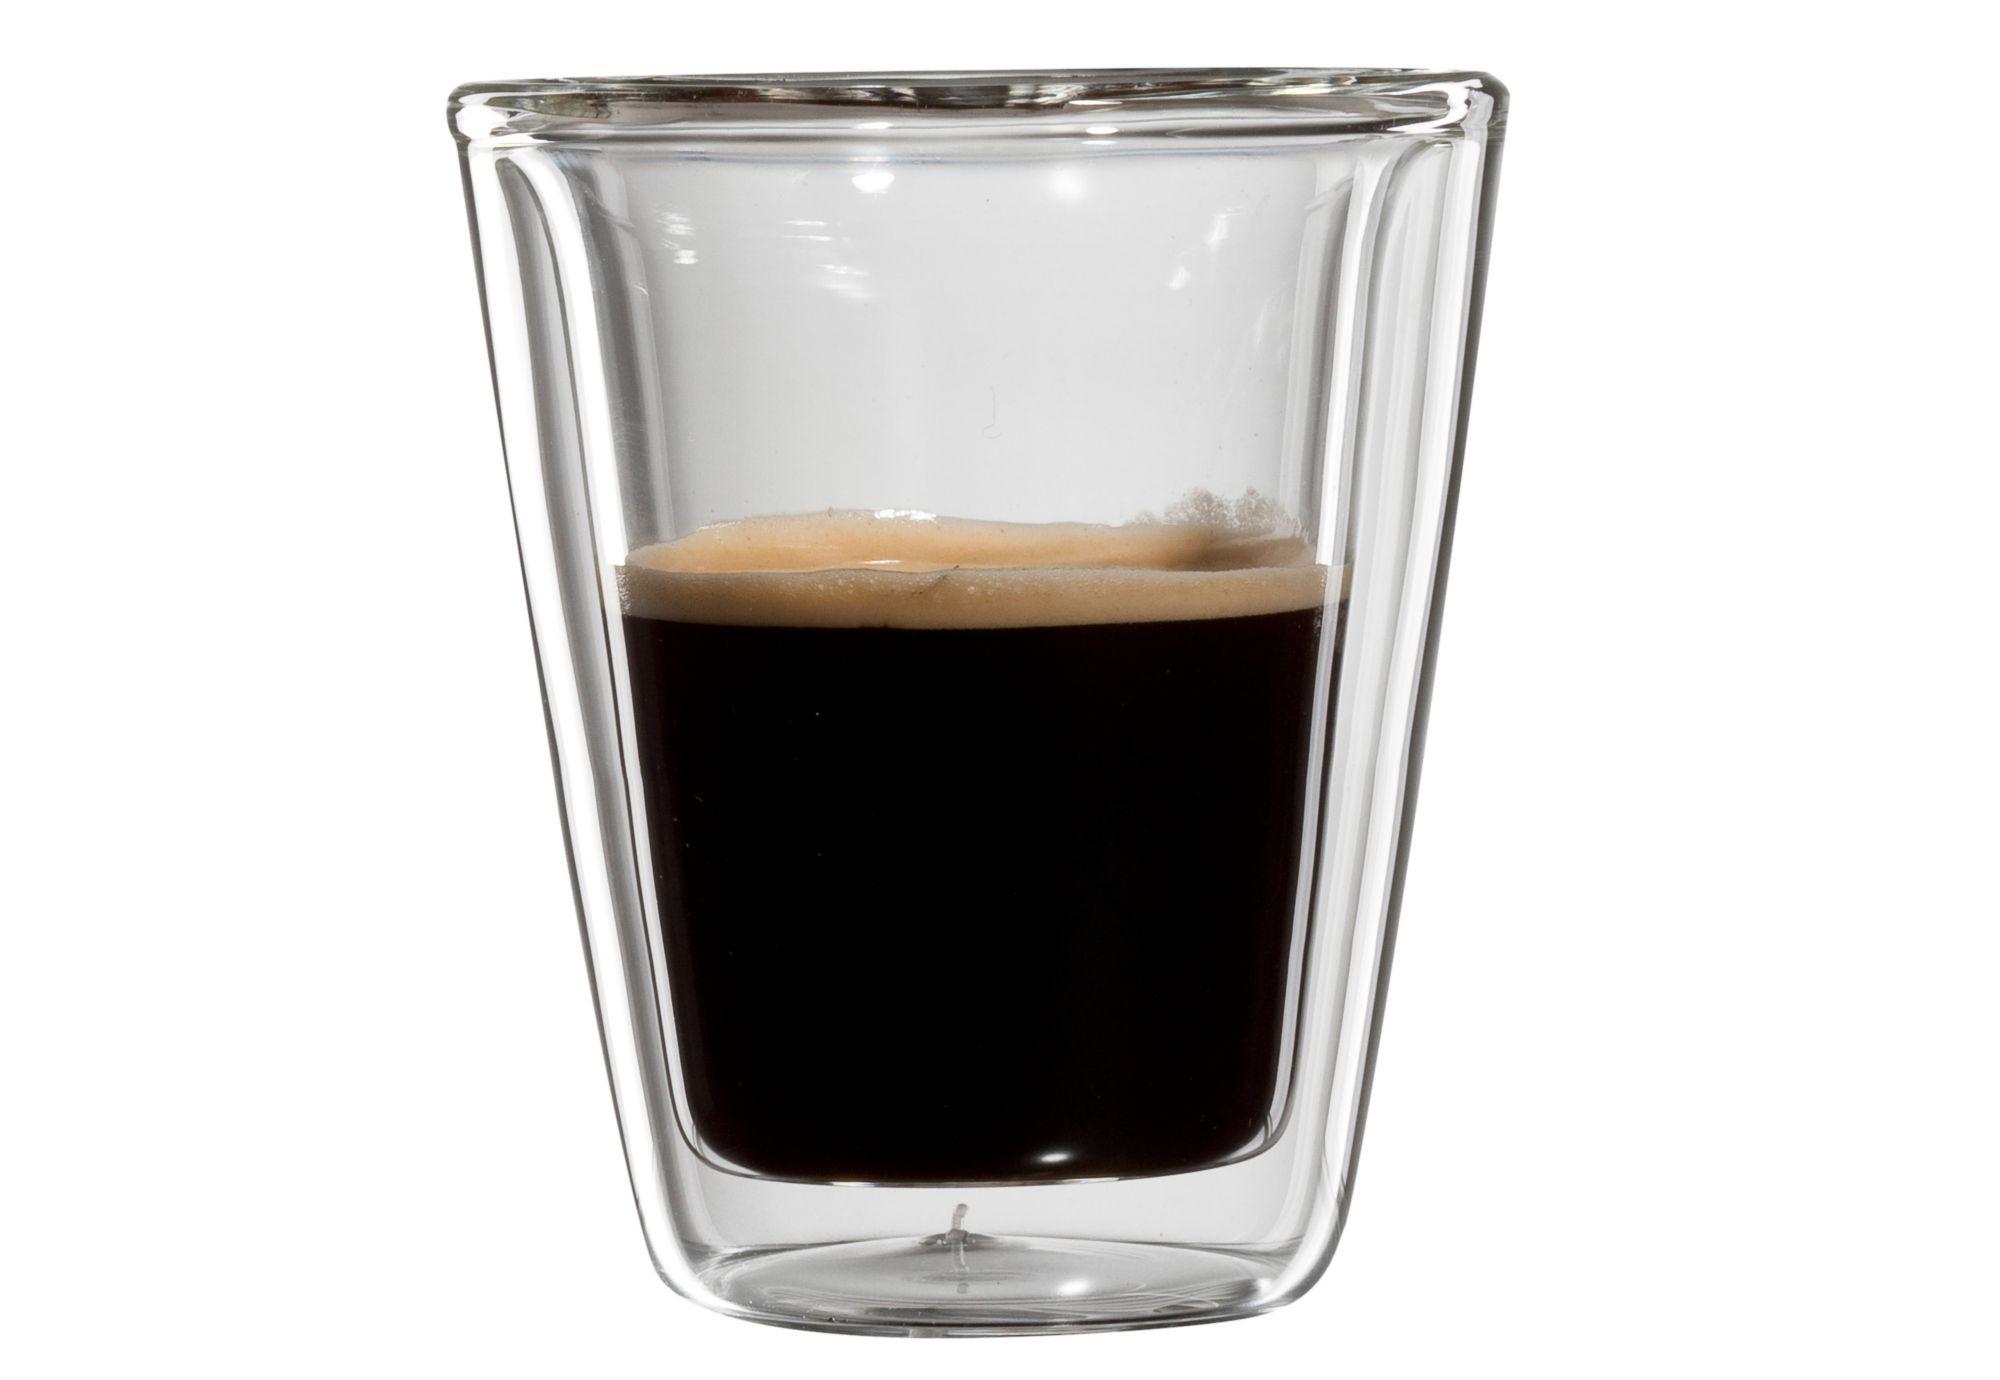 BLOOMIX bloomix Espresso-Glas, 4er Set, »Milano«, 80 ml